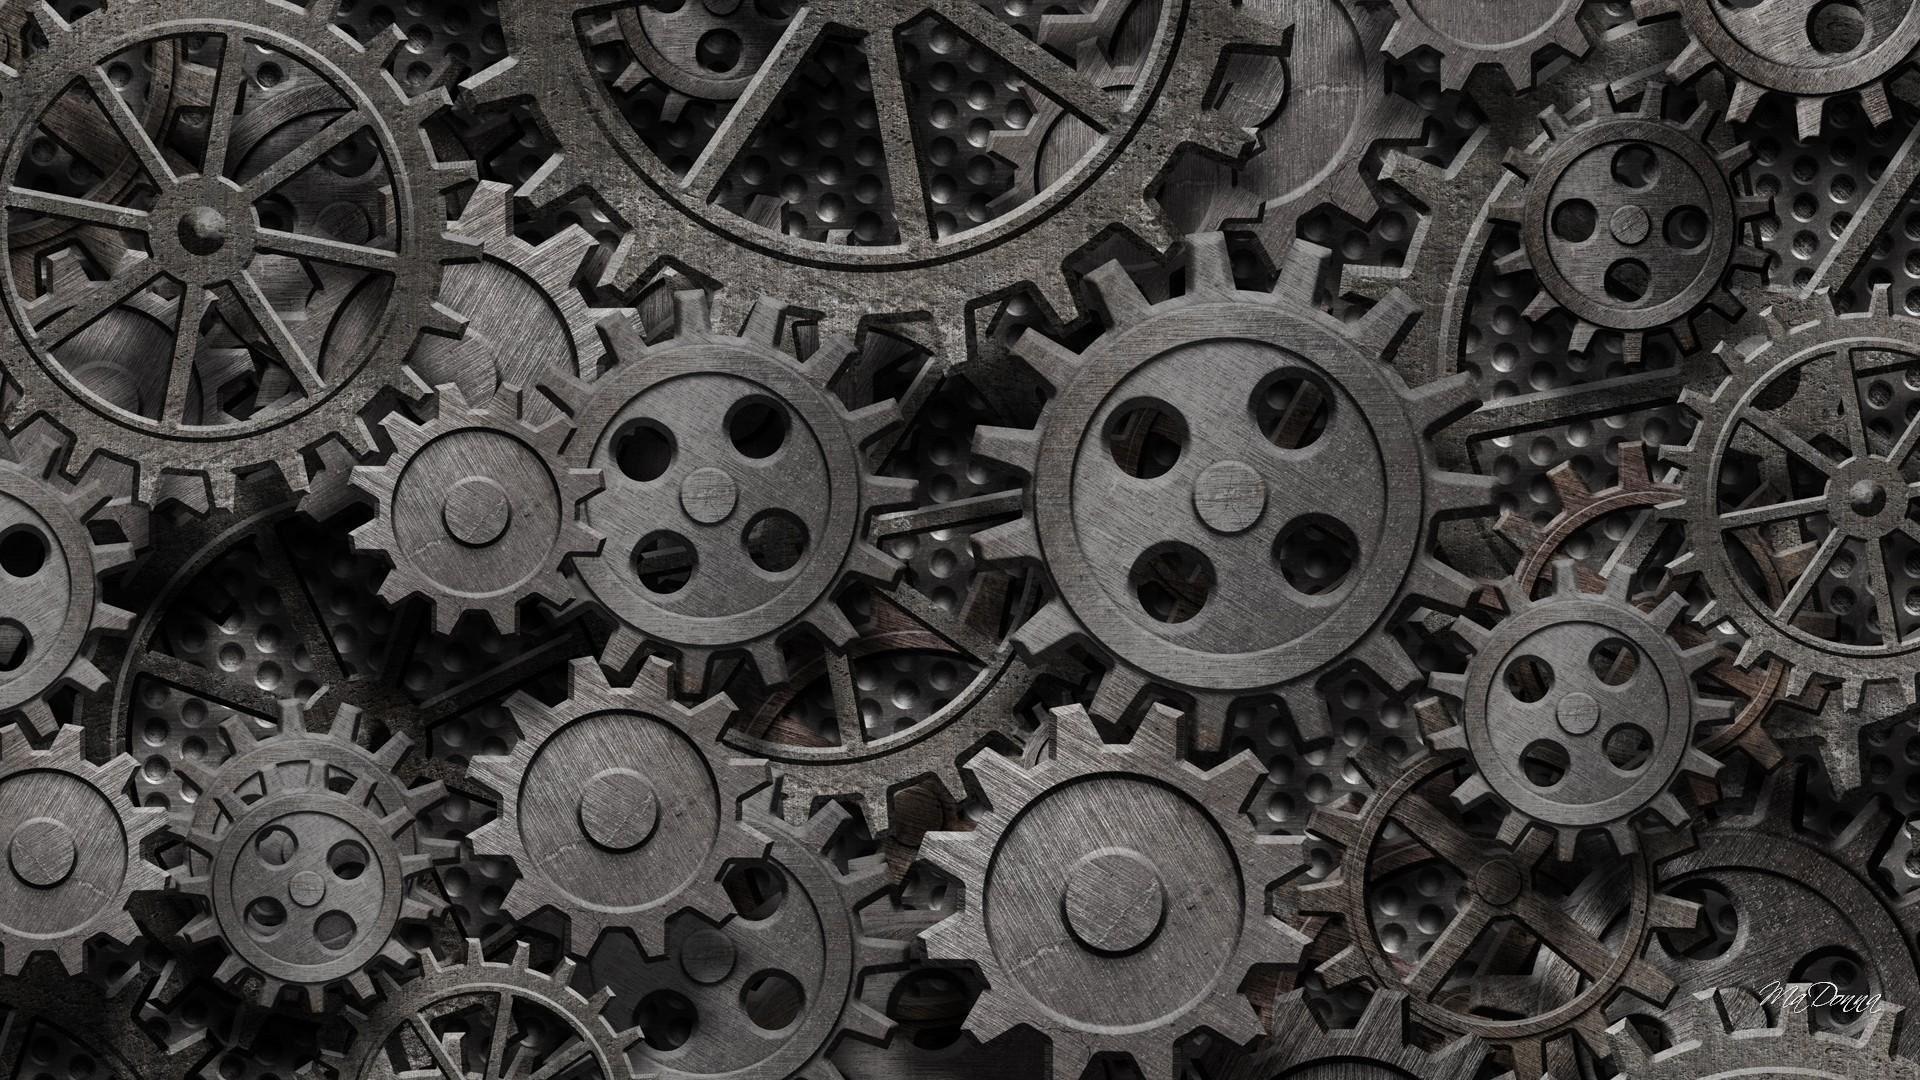 Mechanical Engineering Wallpapers HD